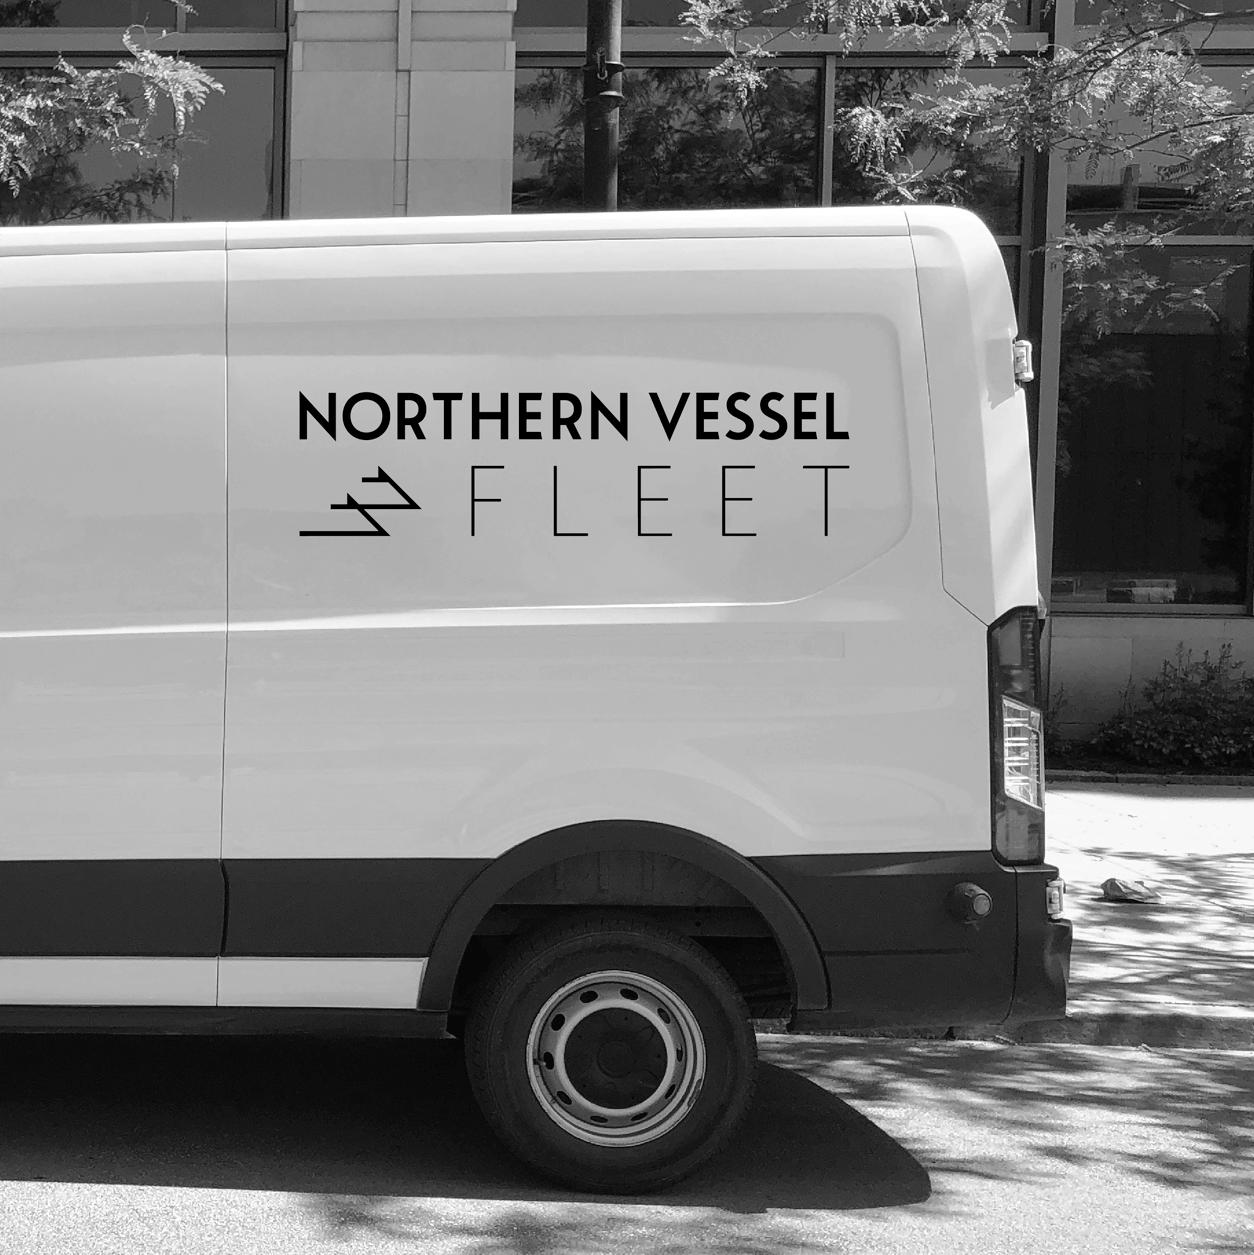 Northern Vessel